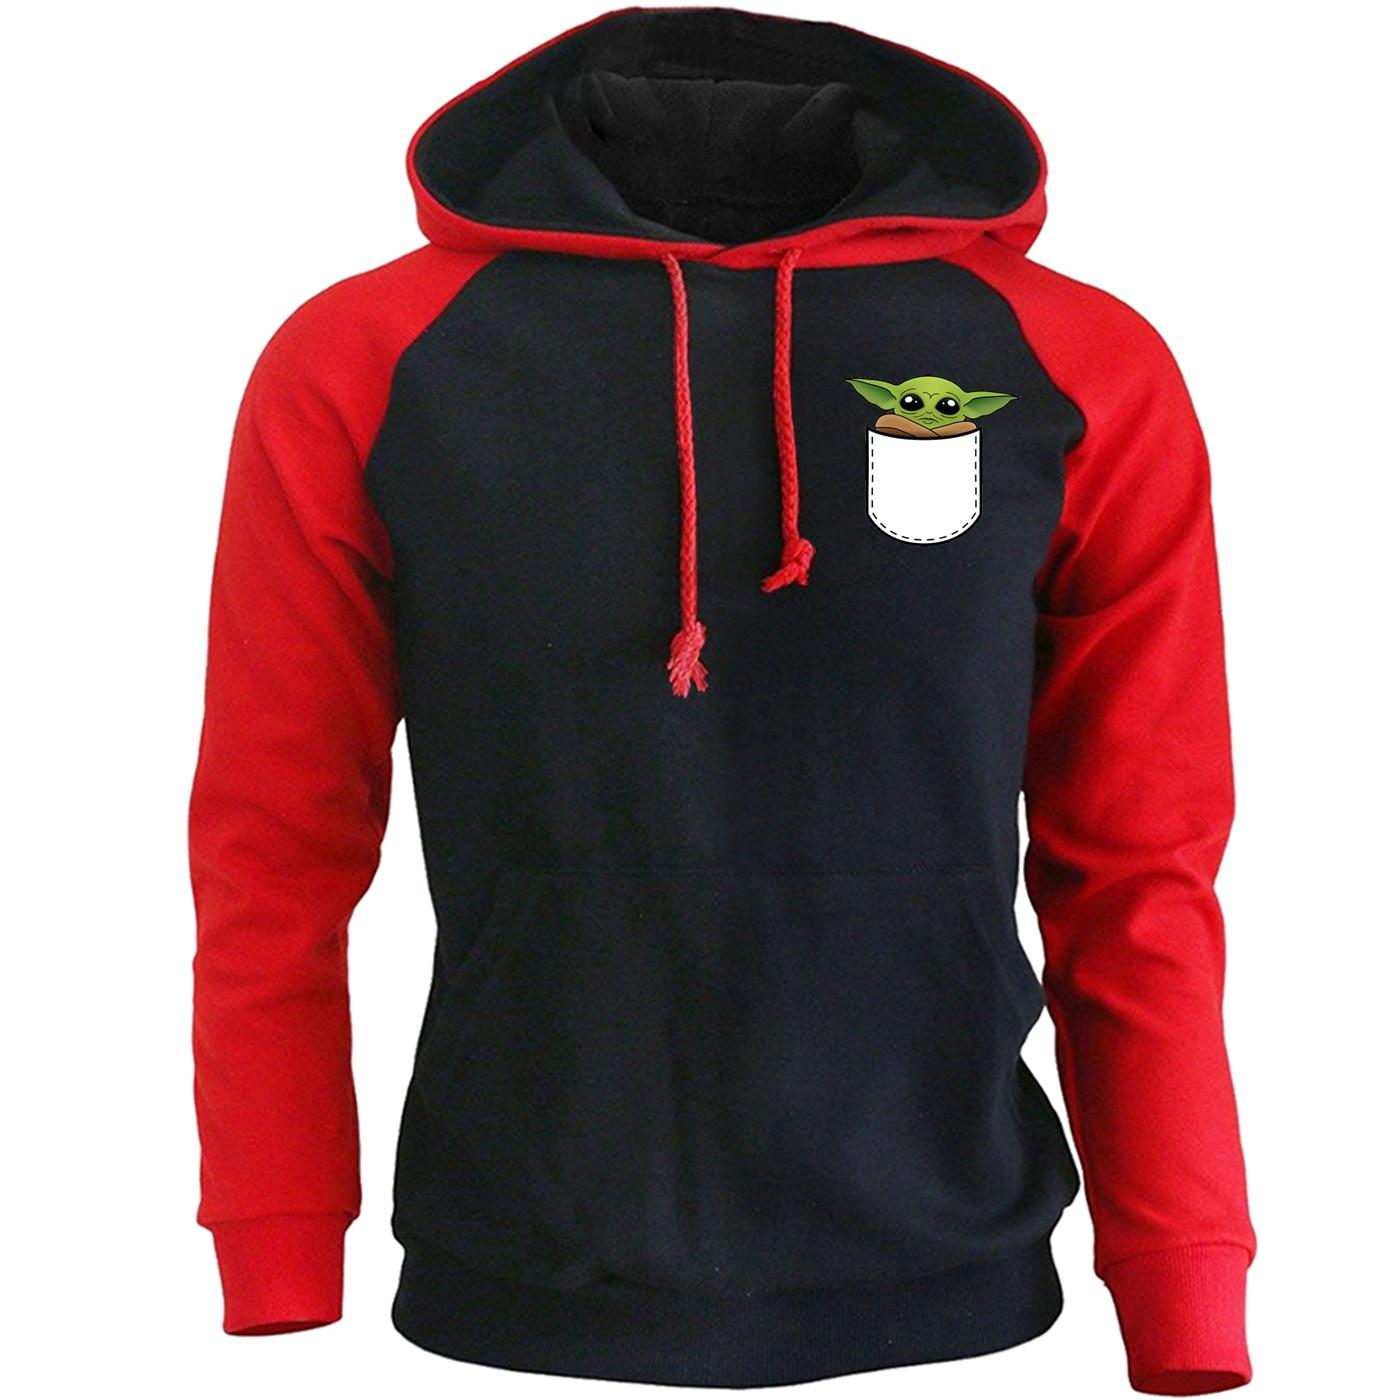 Baby Child Yoda Hoodies Men The Mandalorian Star Wars Mens Sweatshirt 2020 New Spring Casual Lovely Hoodie Streetwear Sportswear